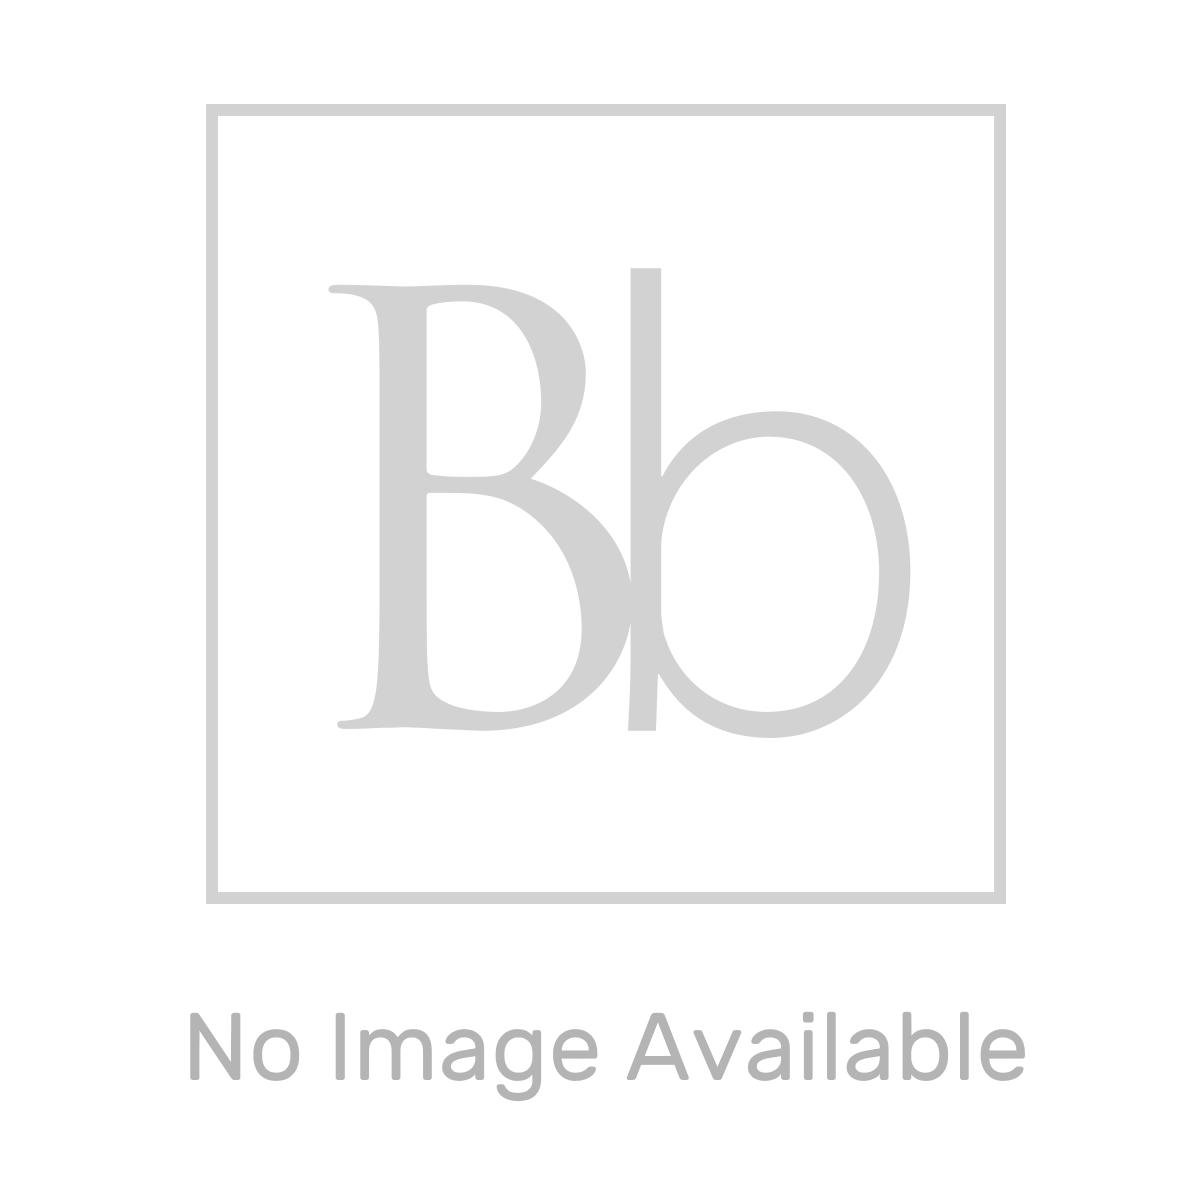 RAK Feeling White Wall Profile 2000mm